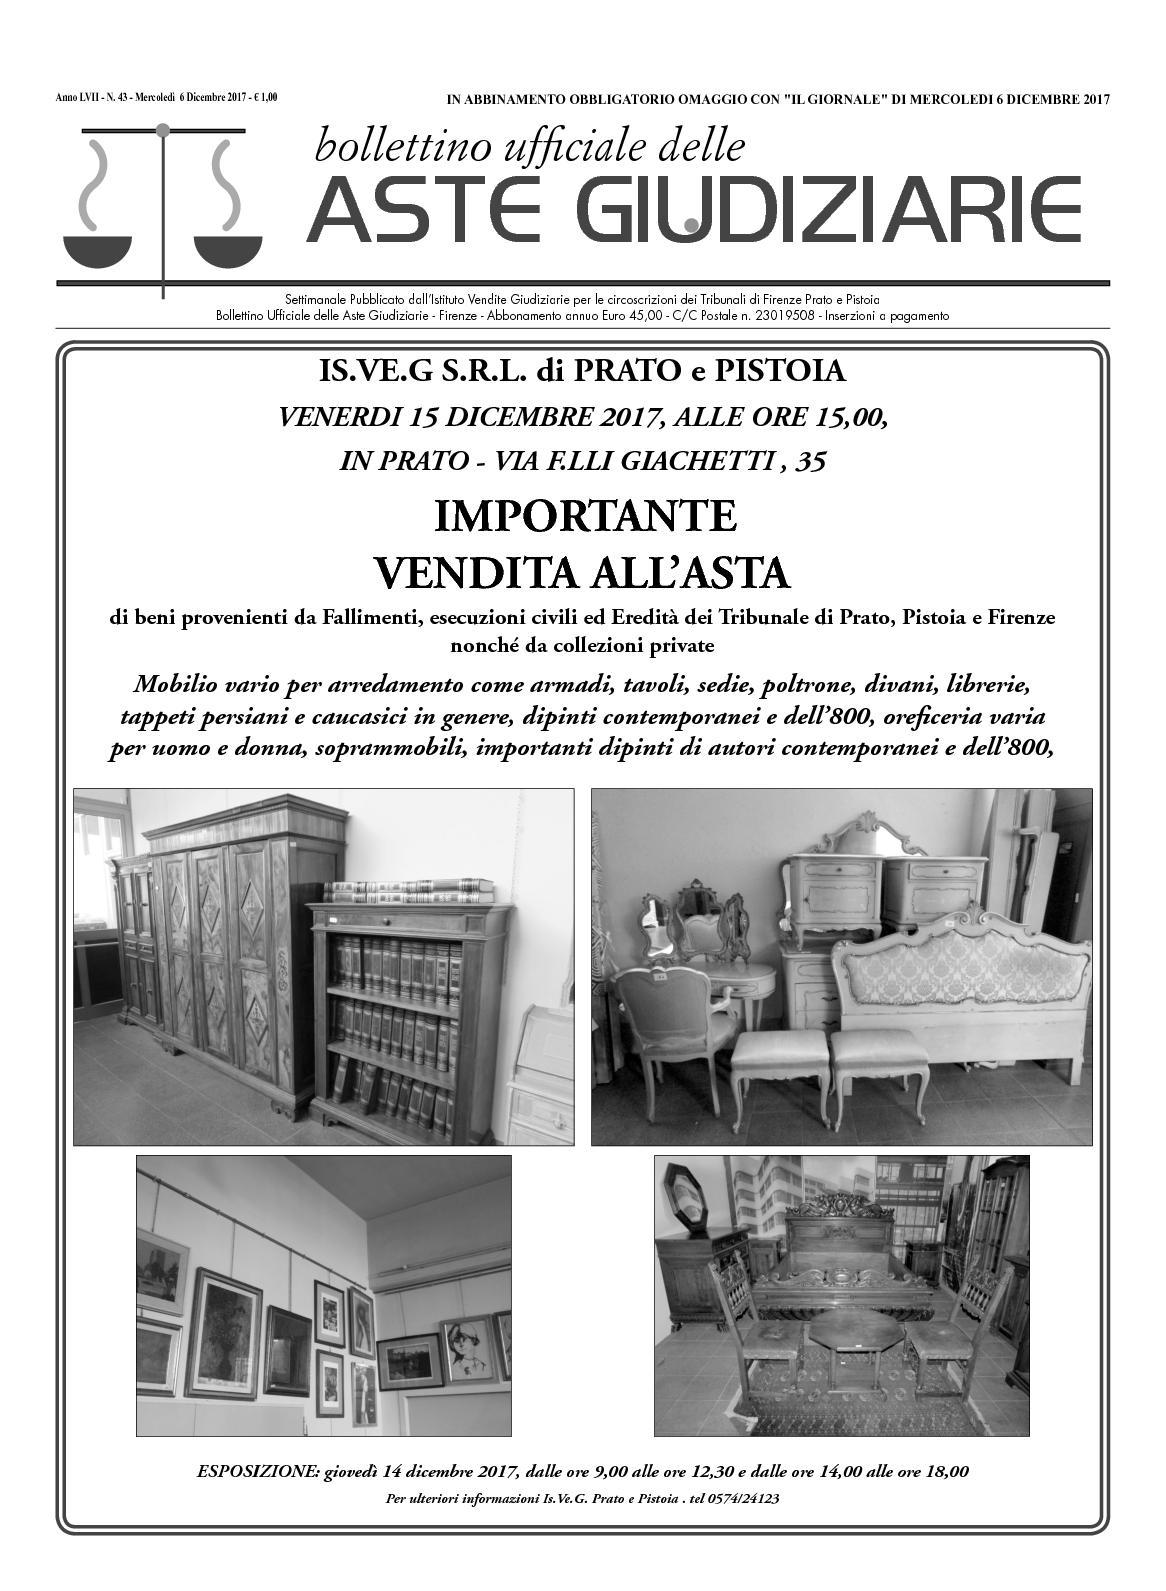 Rational Vassoio In Legno Decoro Vintage Mis Cm 45x32 Complementi D'arredo